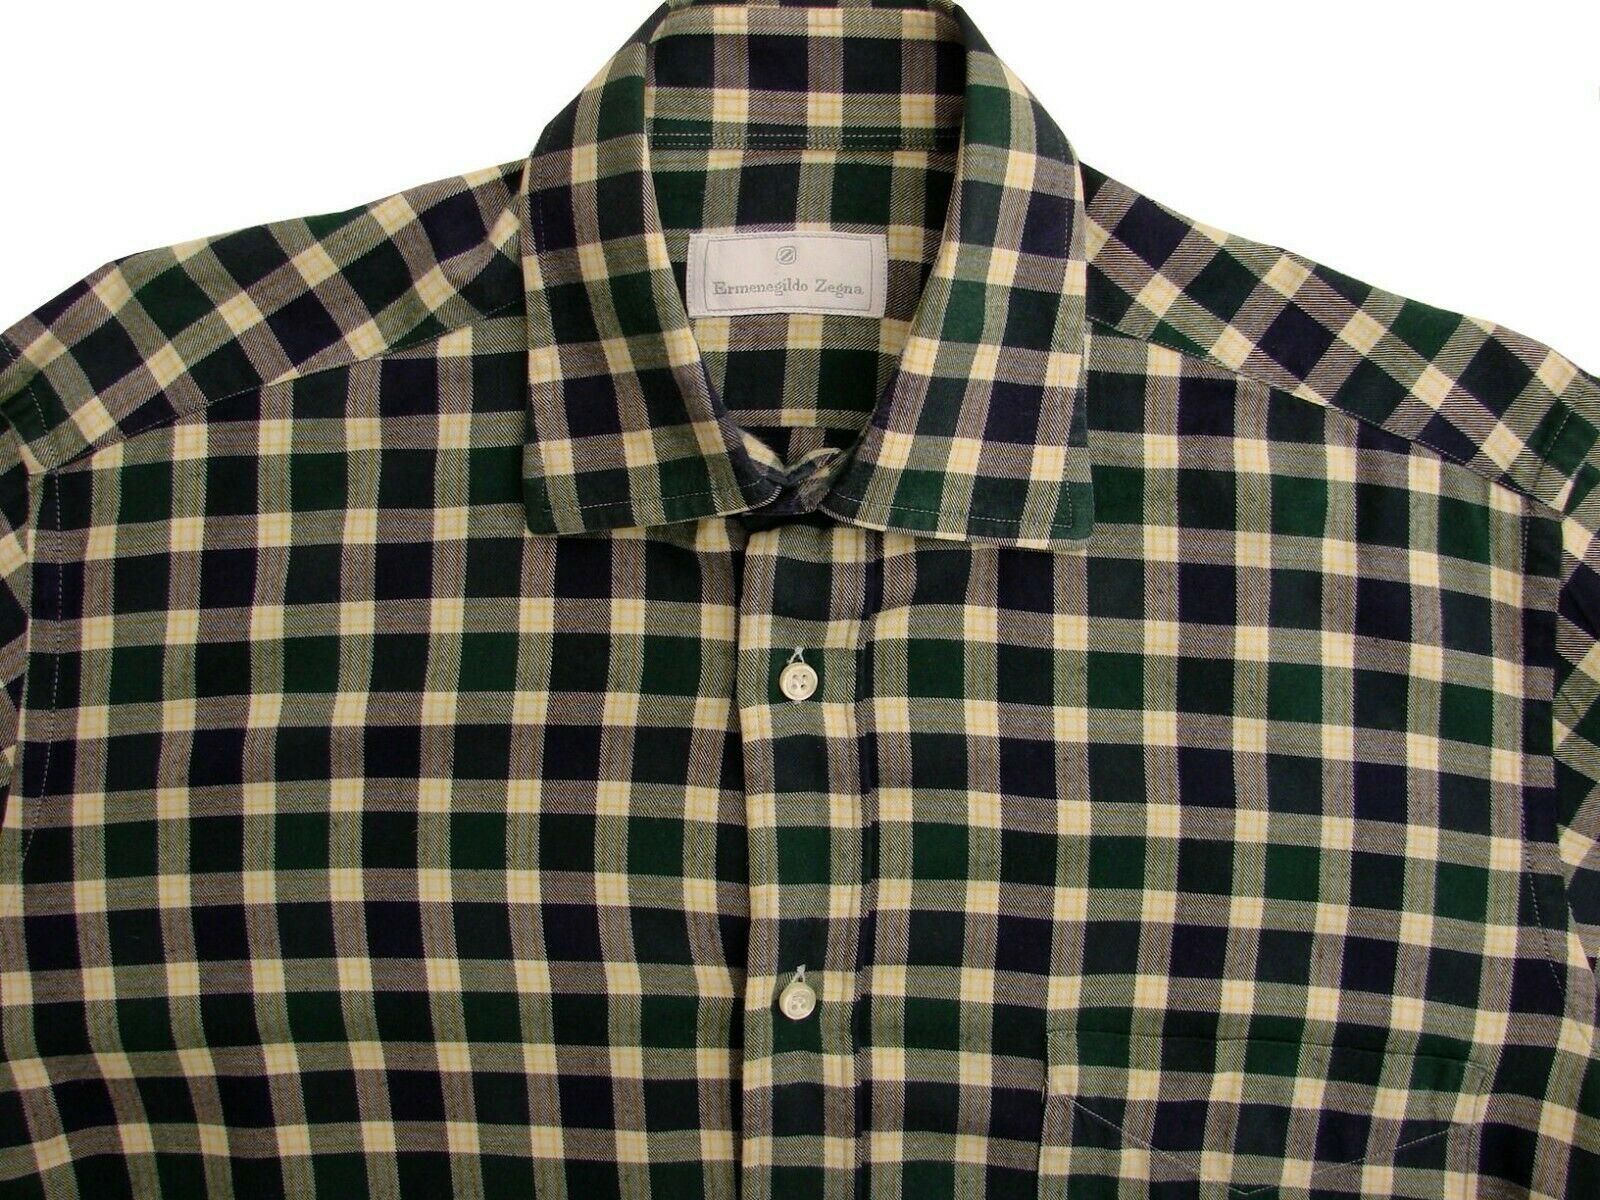 aadc51f7 ERMENEGILDO ZEGNA Shirt Mens 14.5 S Green Blue & Yellow Check FLANNEL